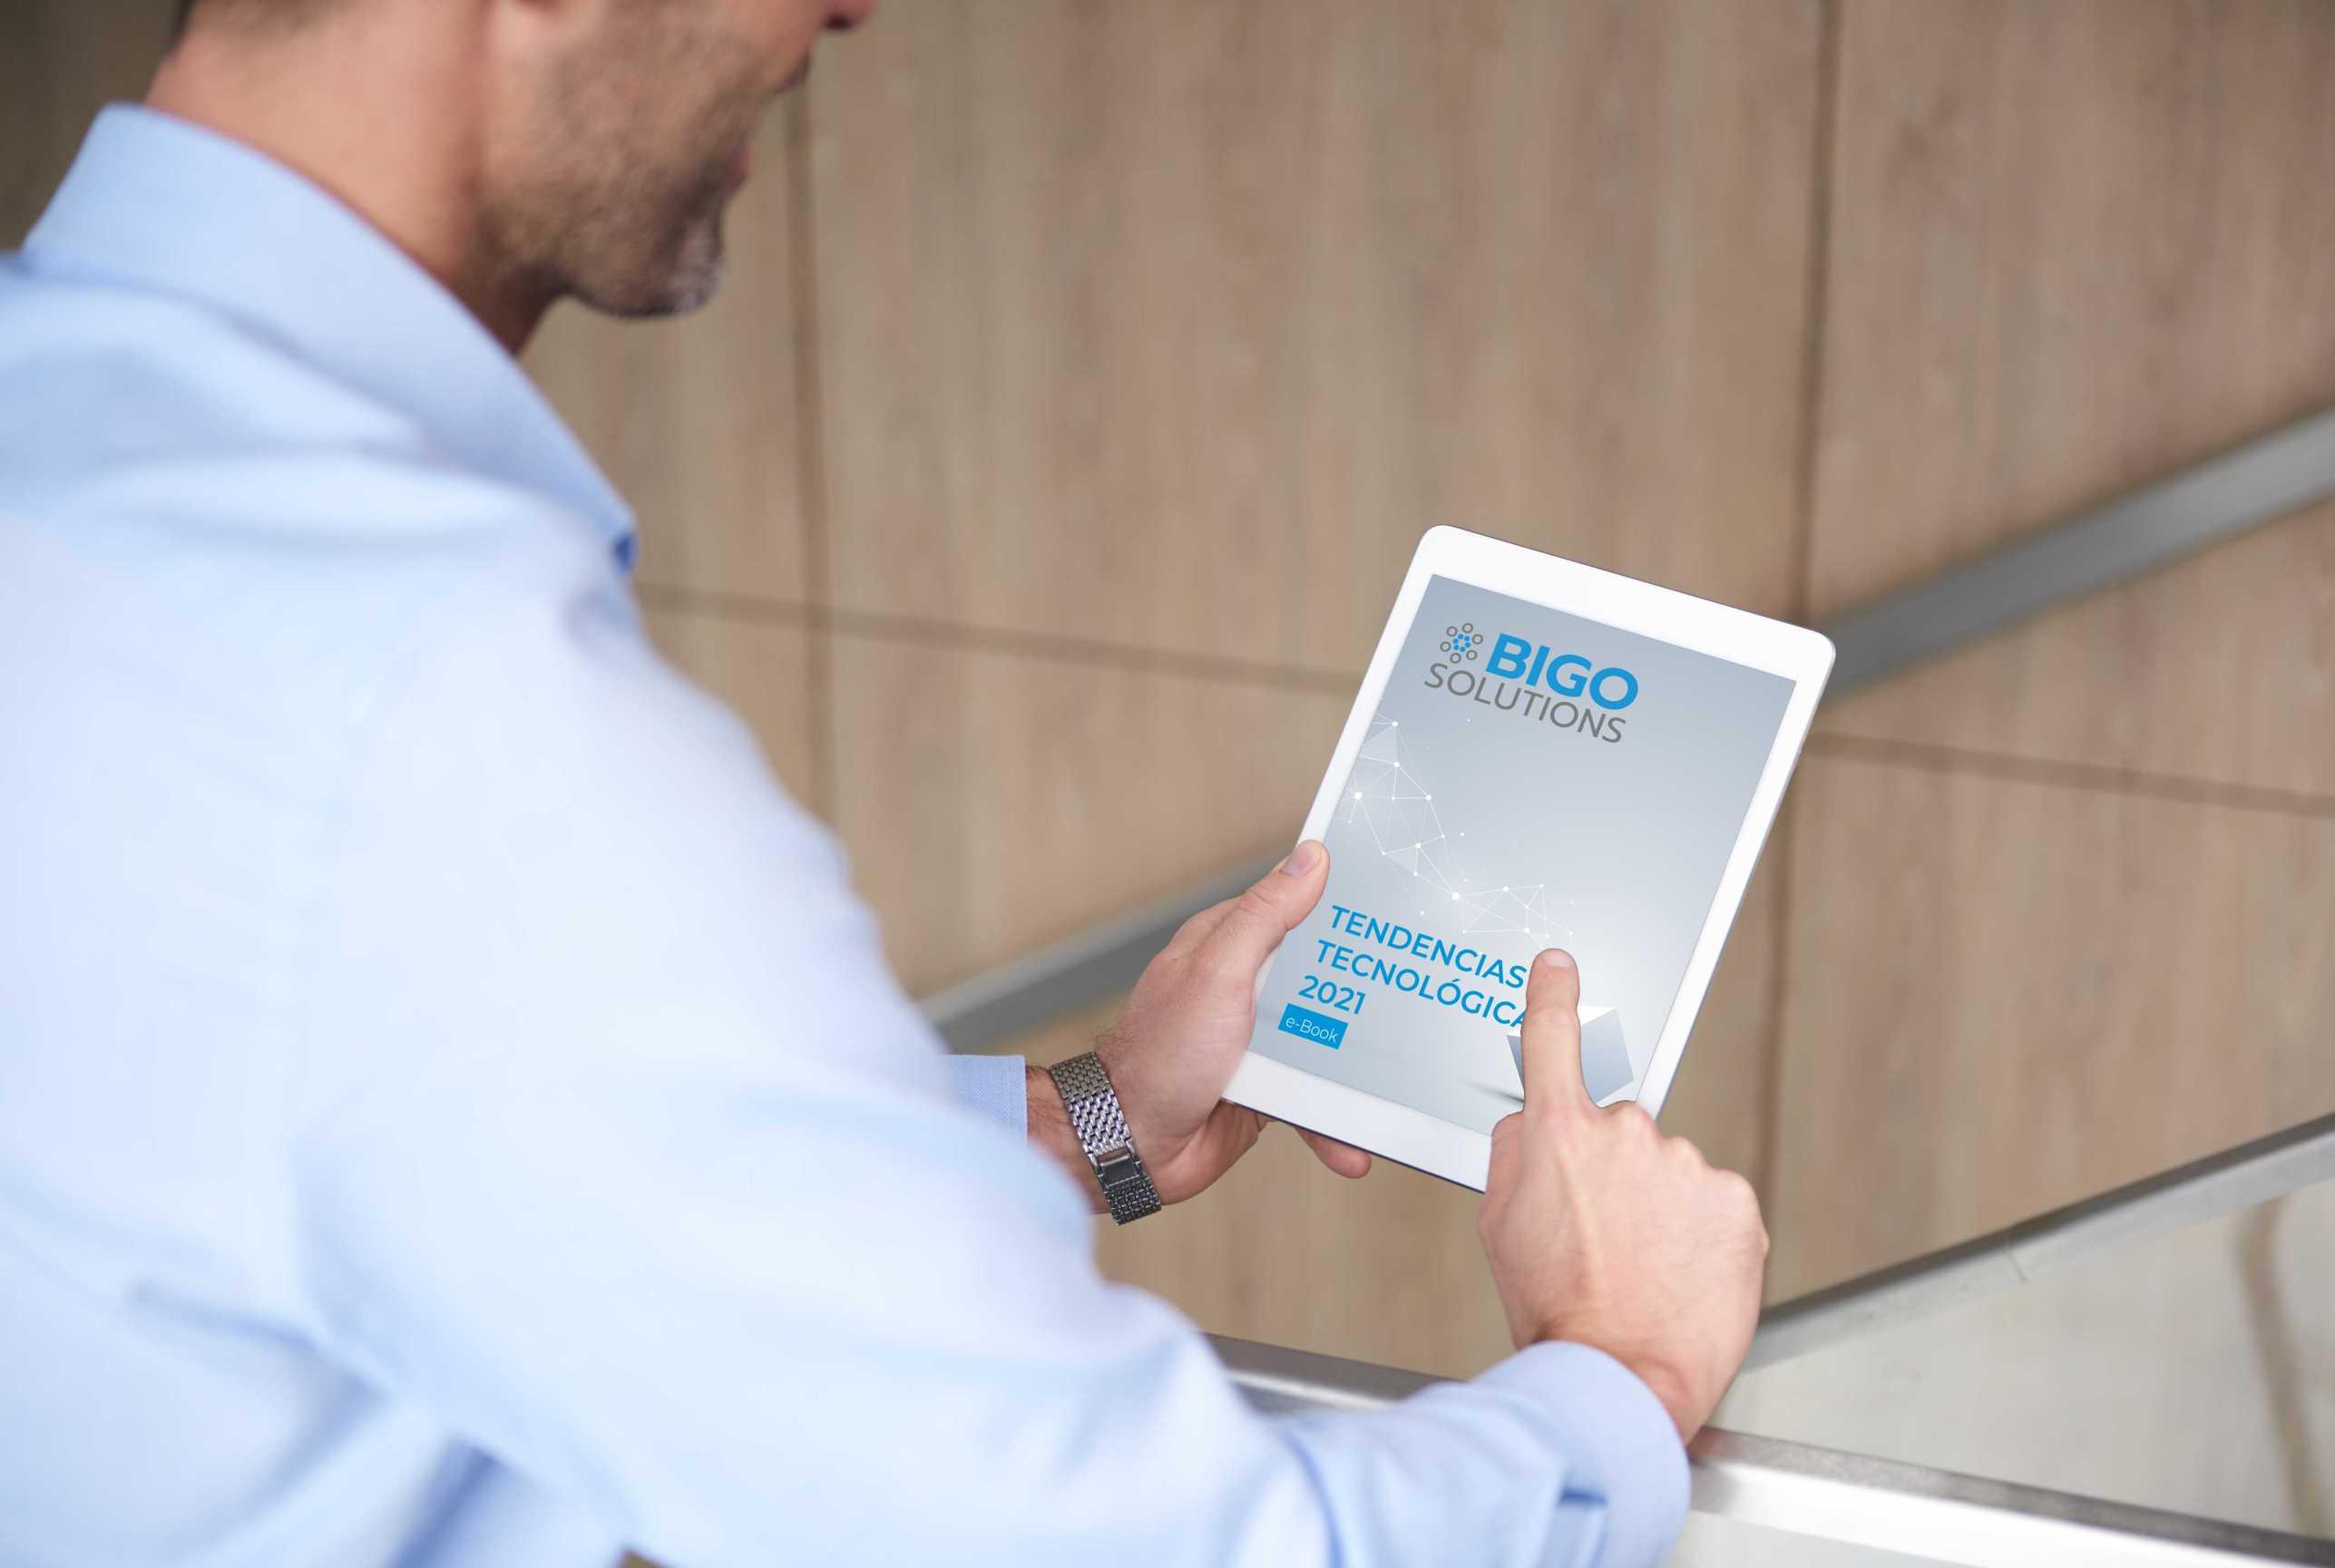 ebook tendencias tecnologicas